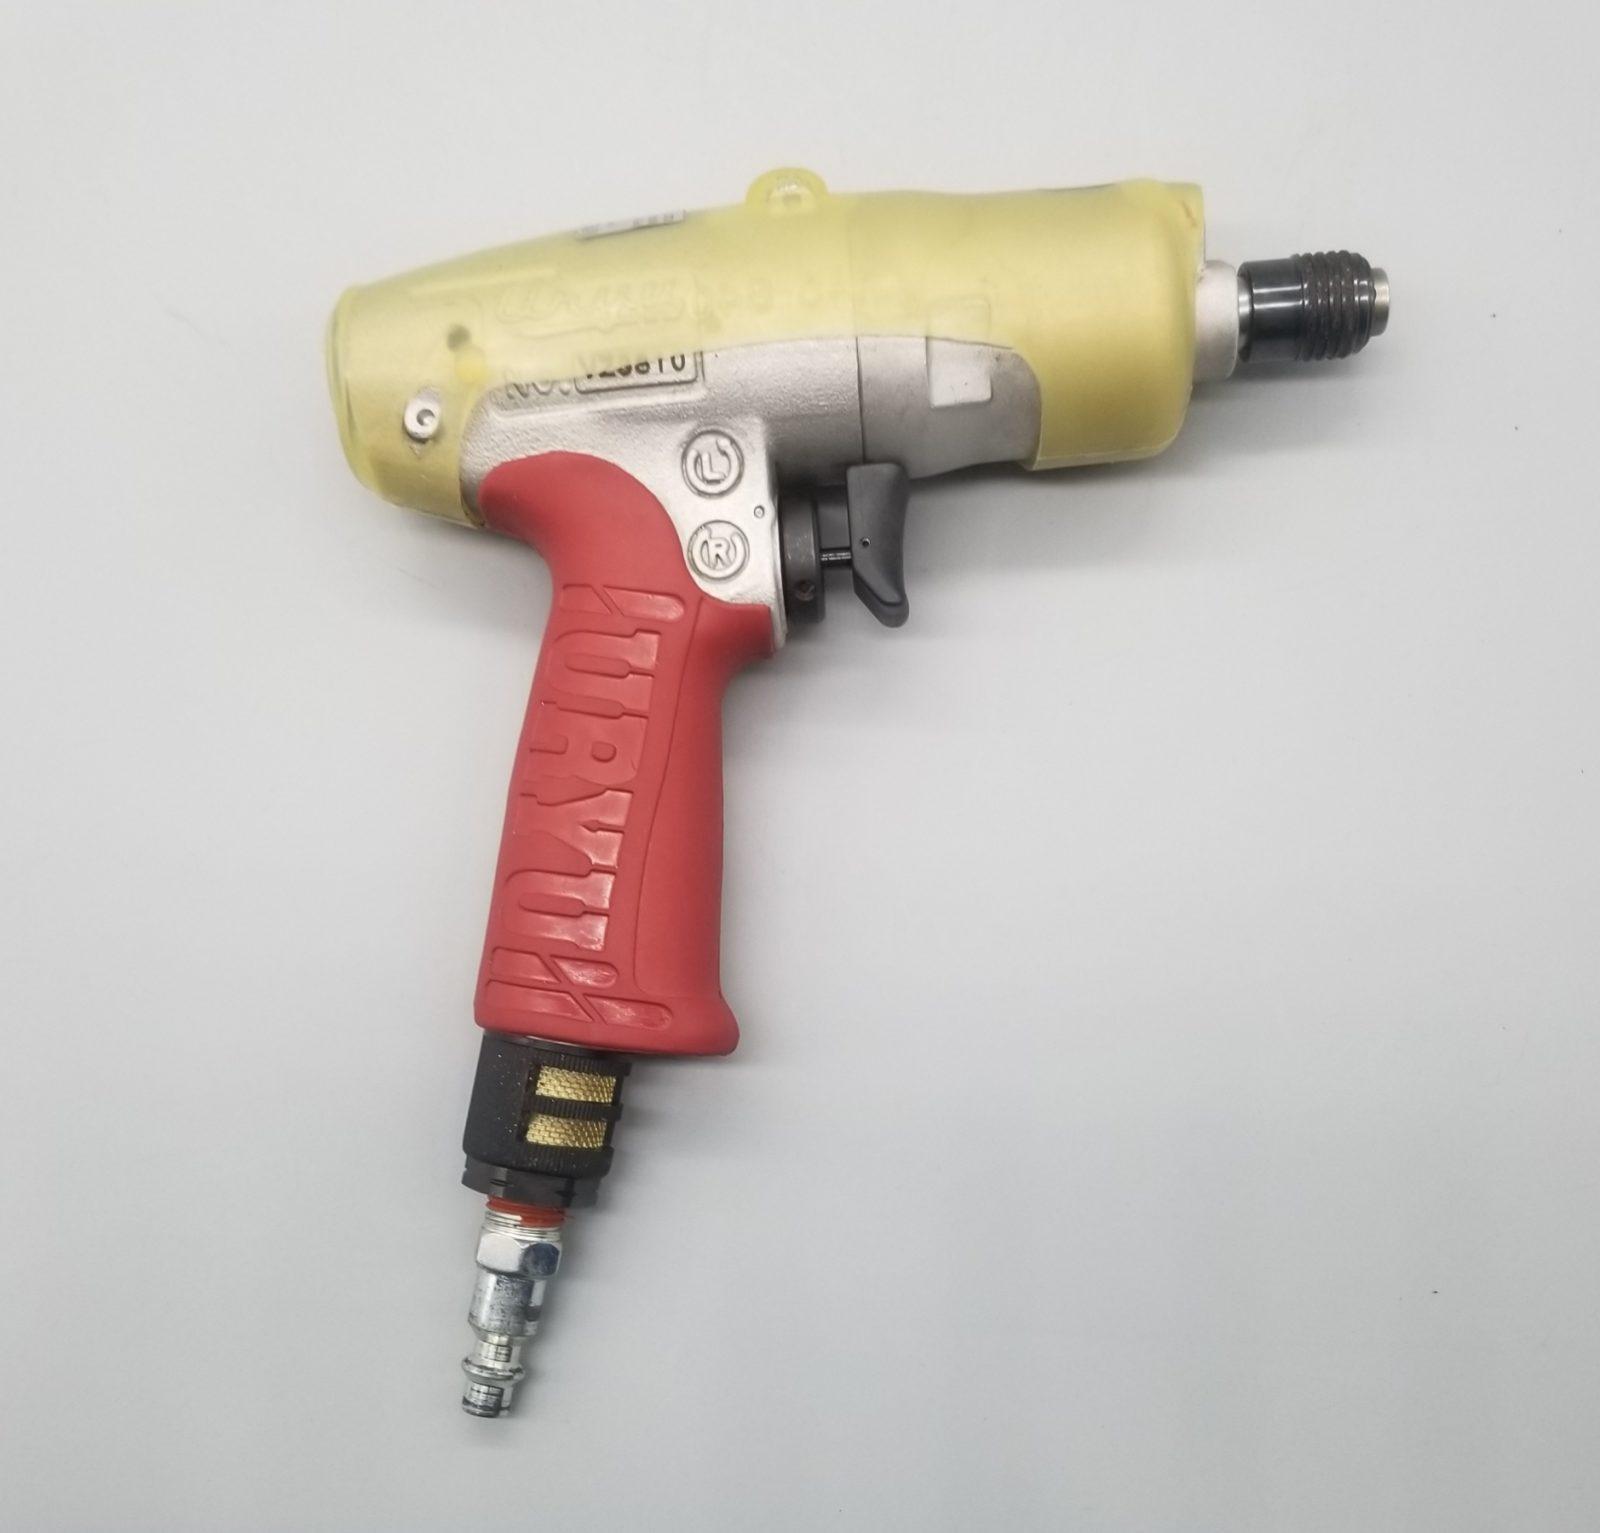 Aimco Uryu UAT60D  Pistol Grip Auto Shut Off Pulse Tool, 1/4 in. hex